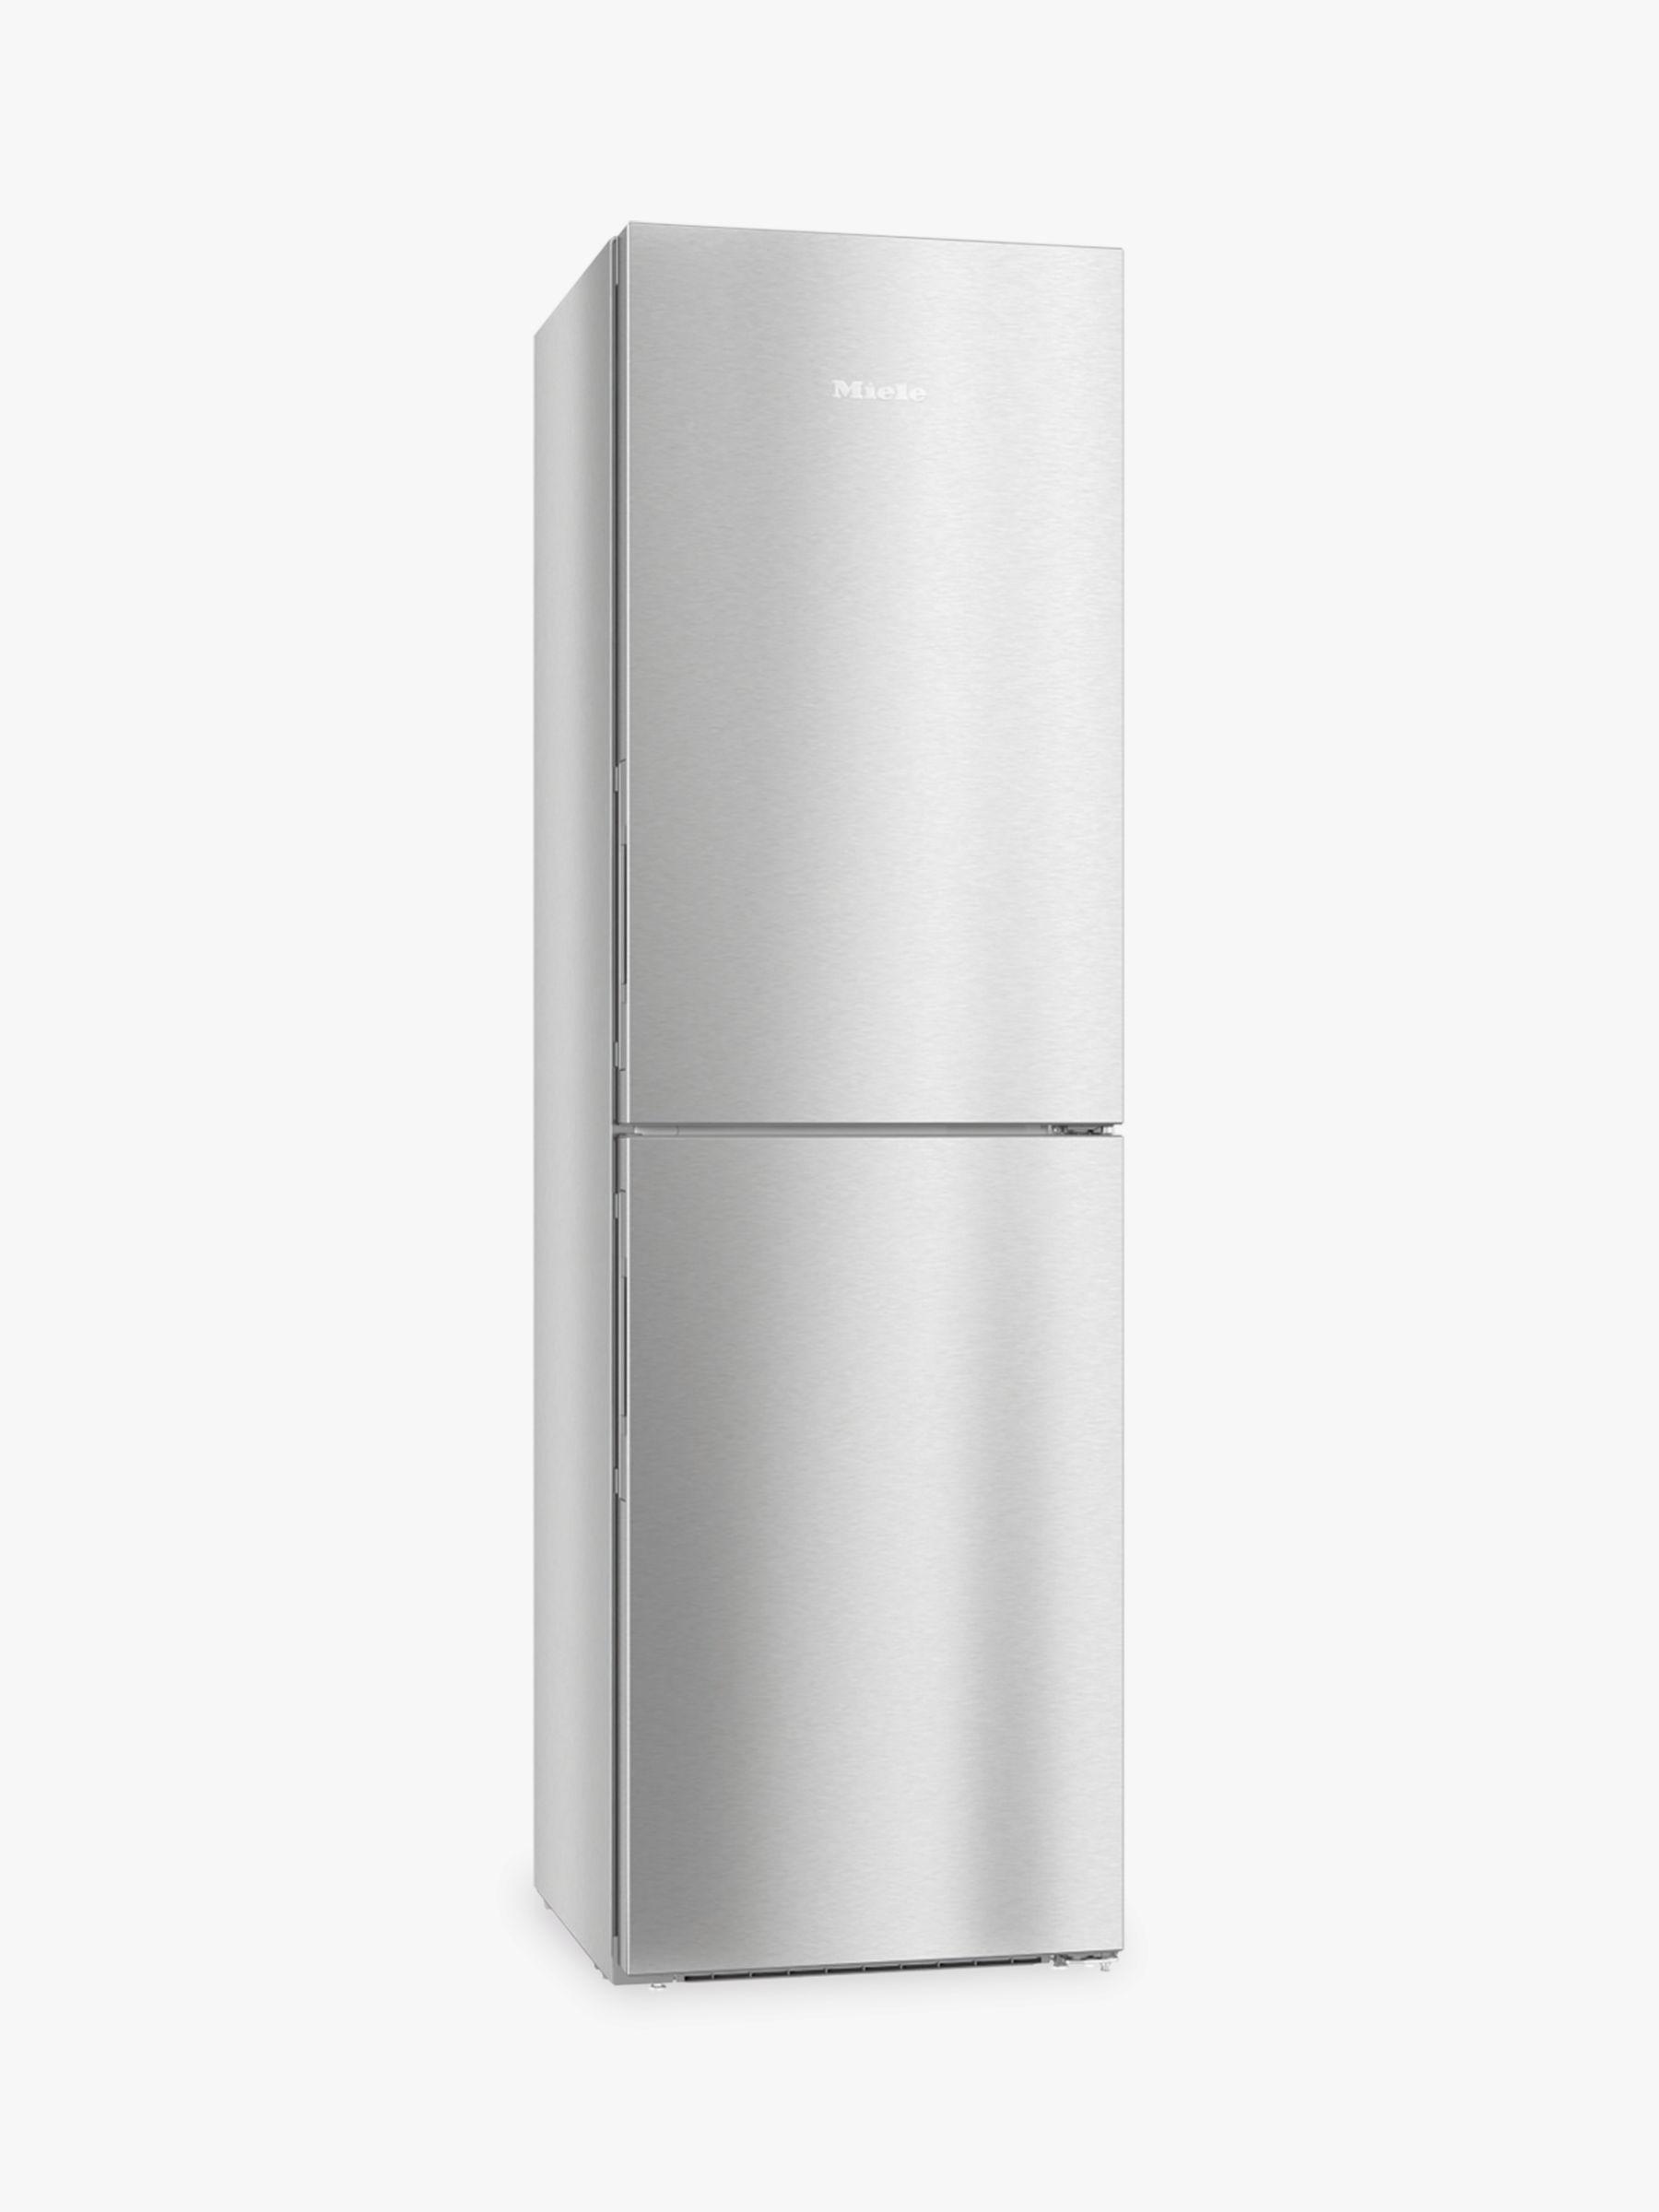 Miele Miele KFN 29243D Freestanding Fridge Freezer, 60cm Wide, A+++ Energy Rating, Stainless Steel